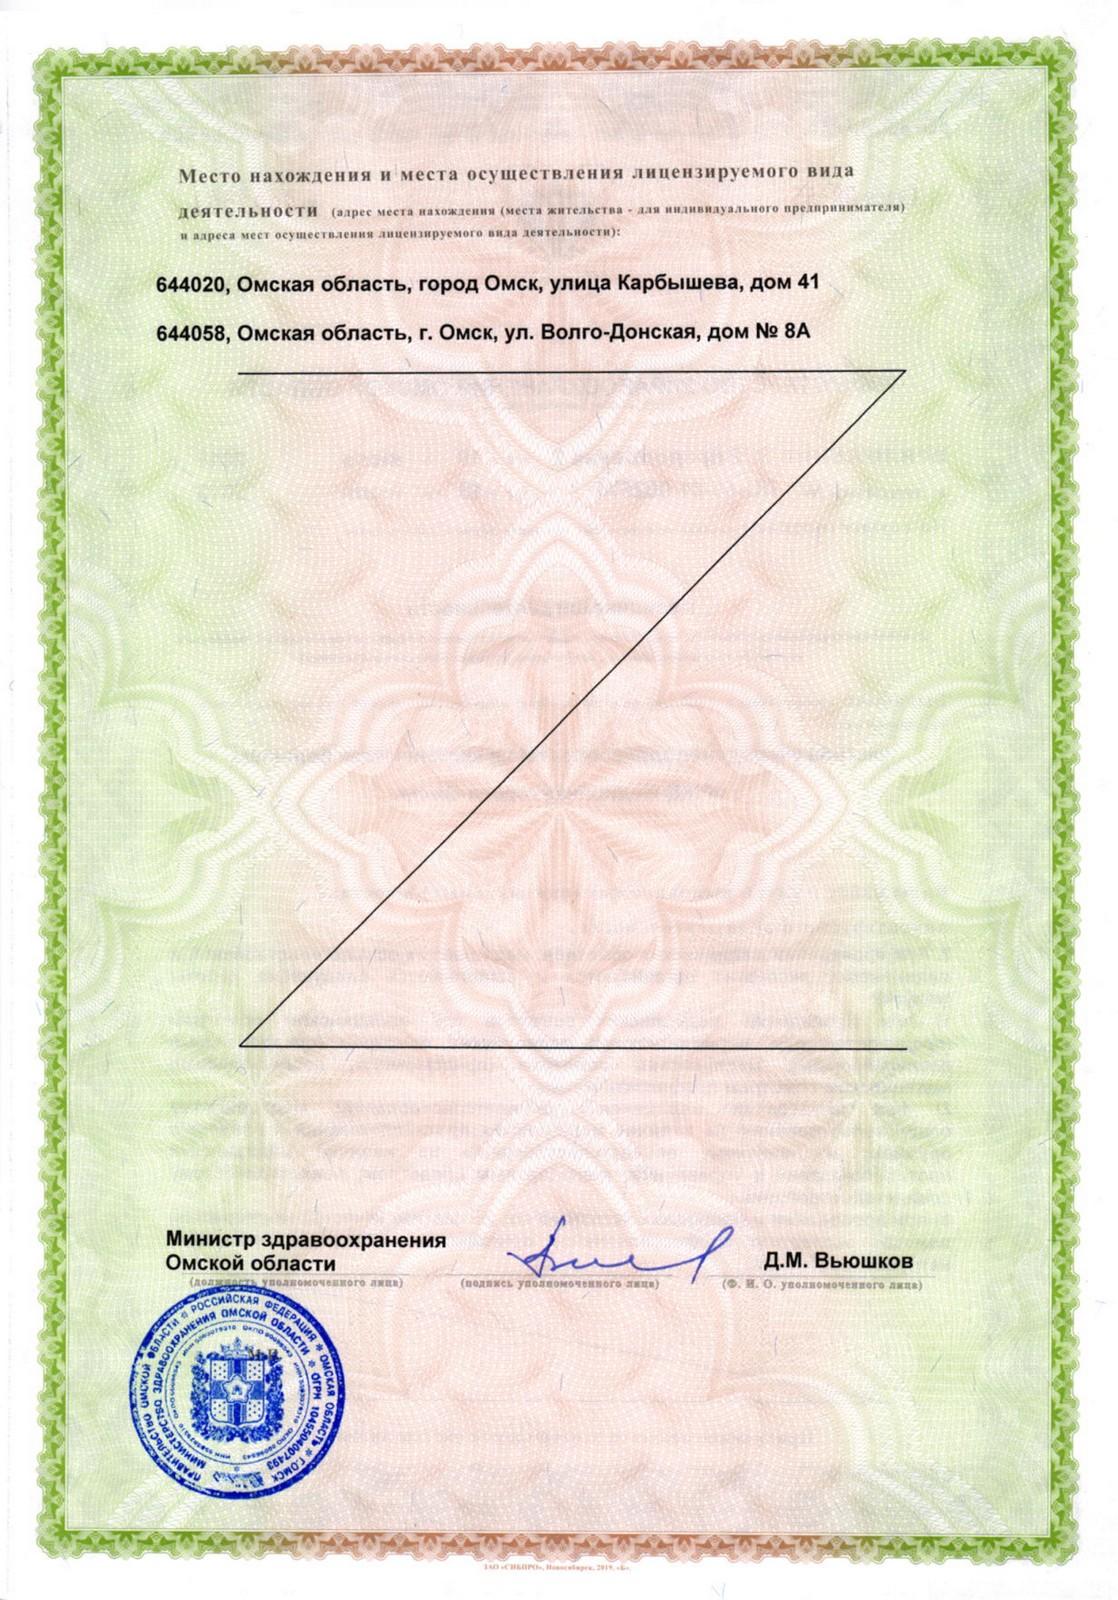 License-2019-07-18_26